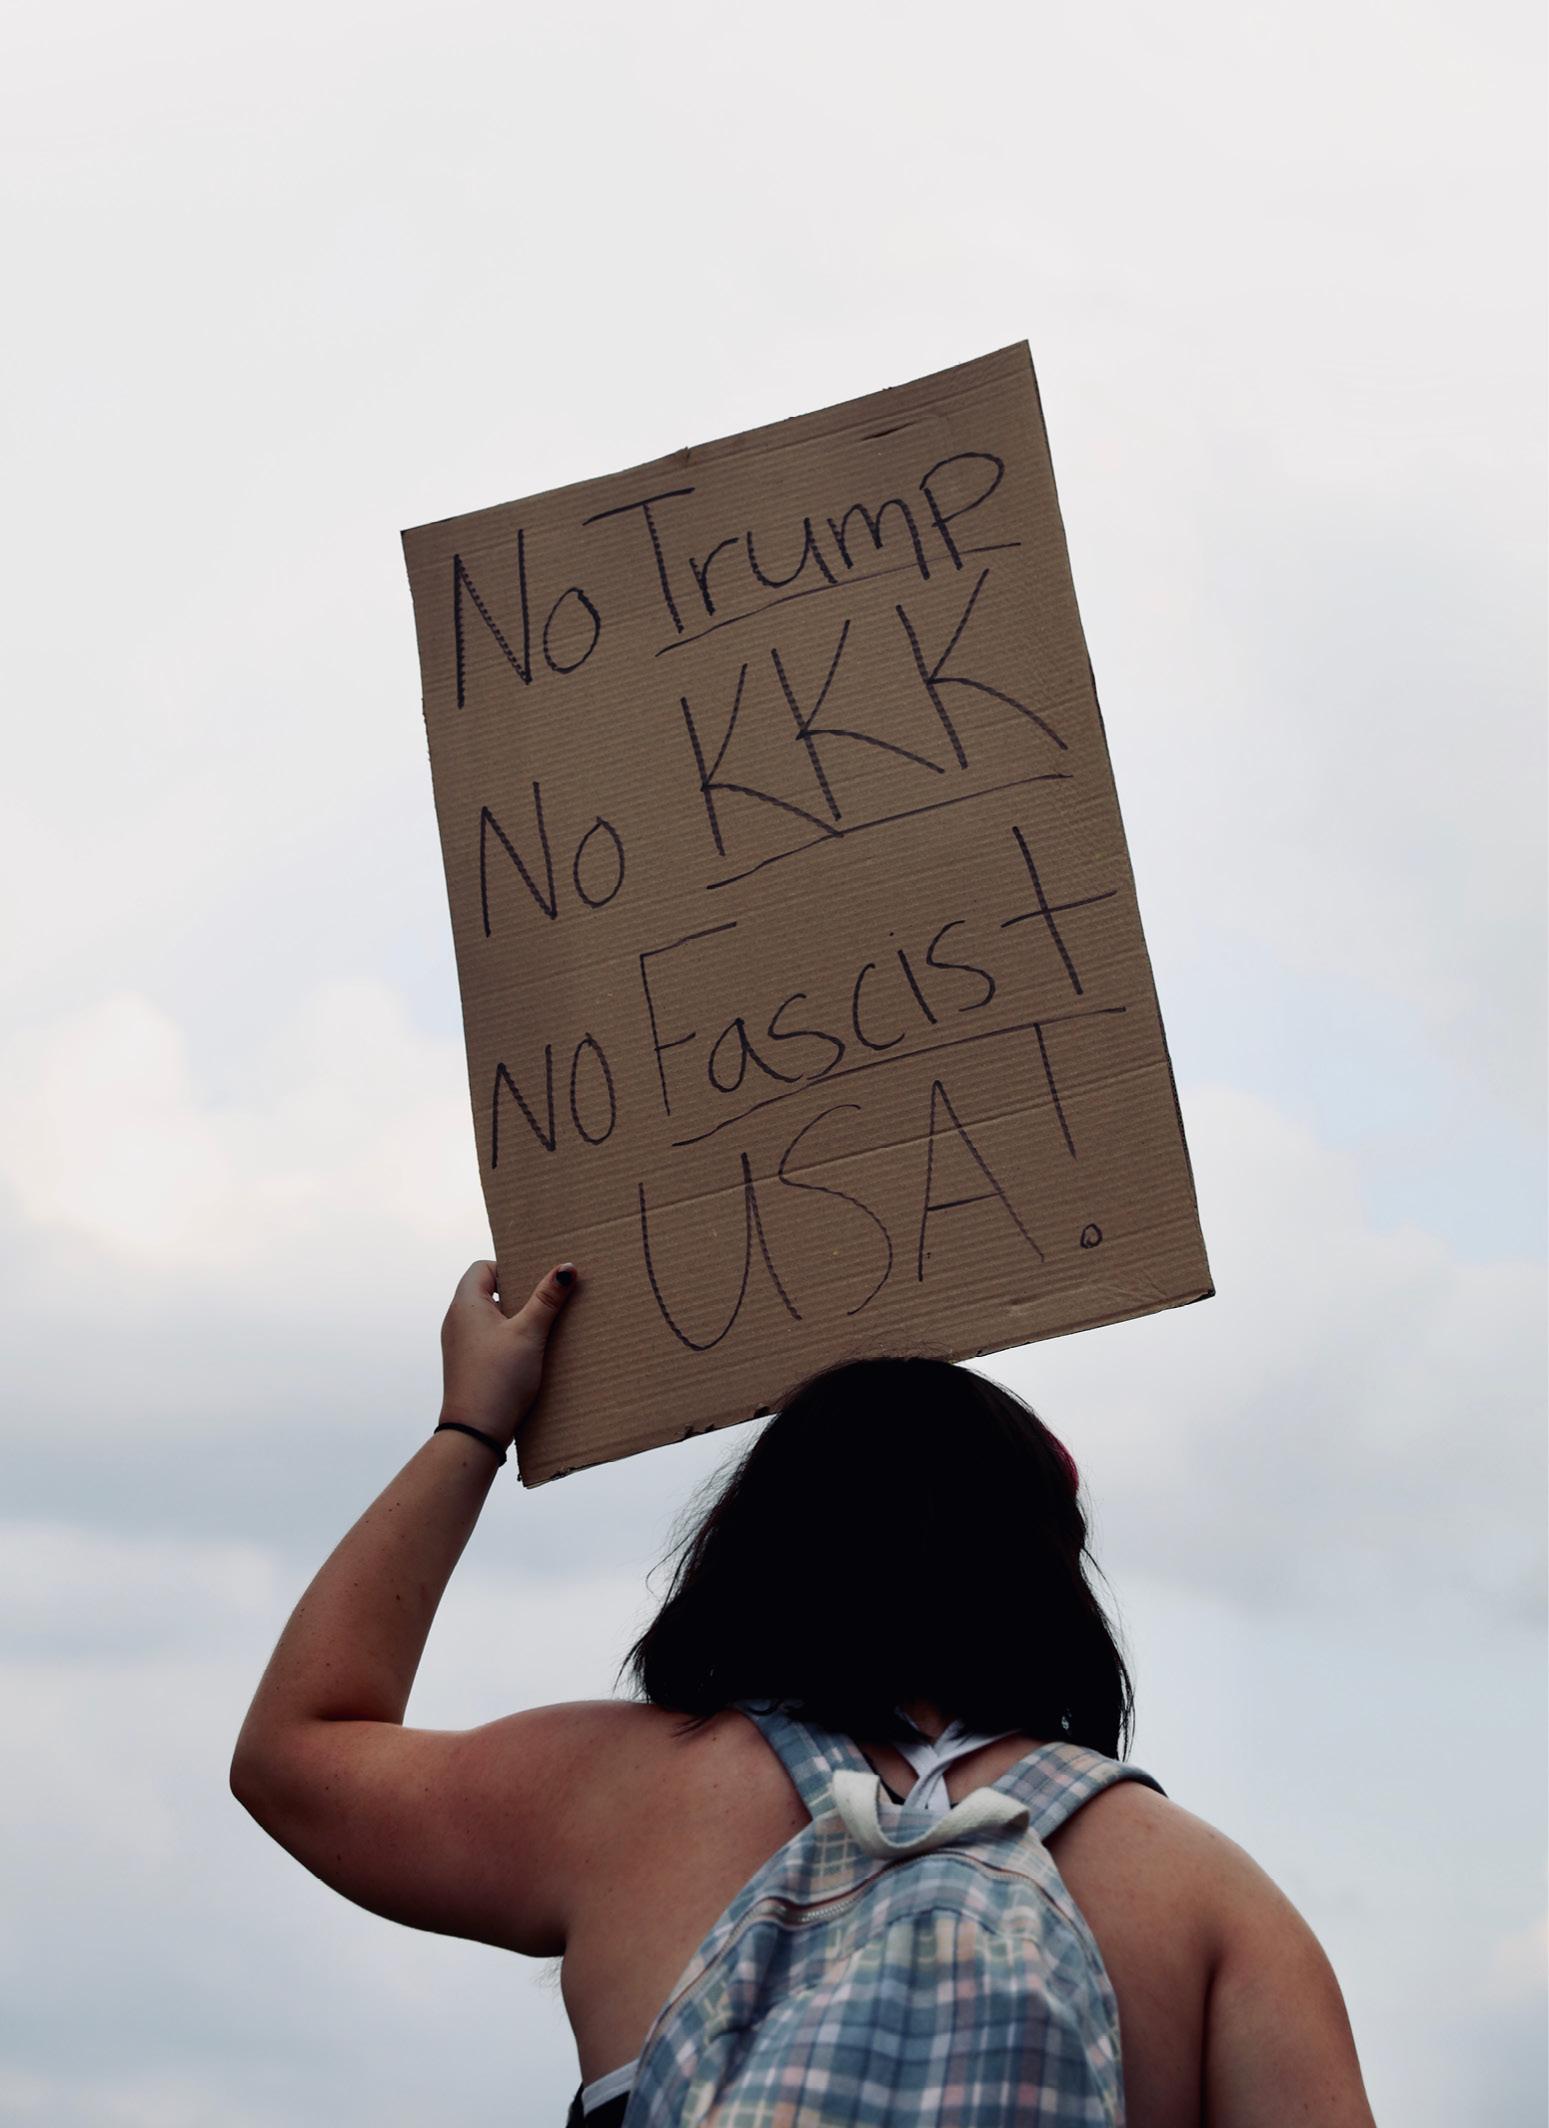 Andy Grant Trump Rally 8.1.19 - II19.jpg